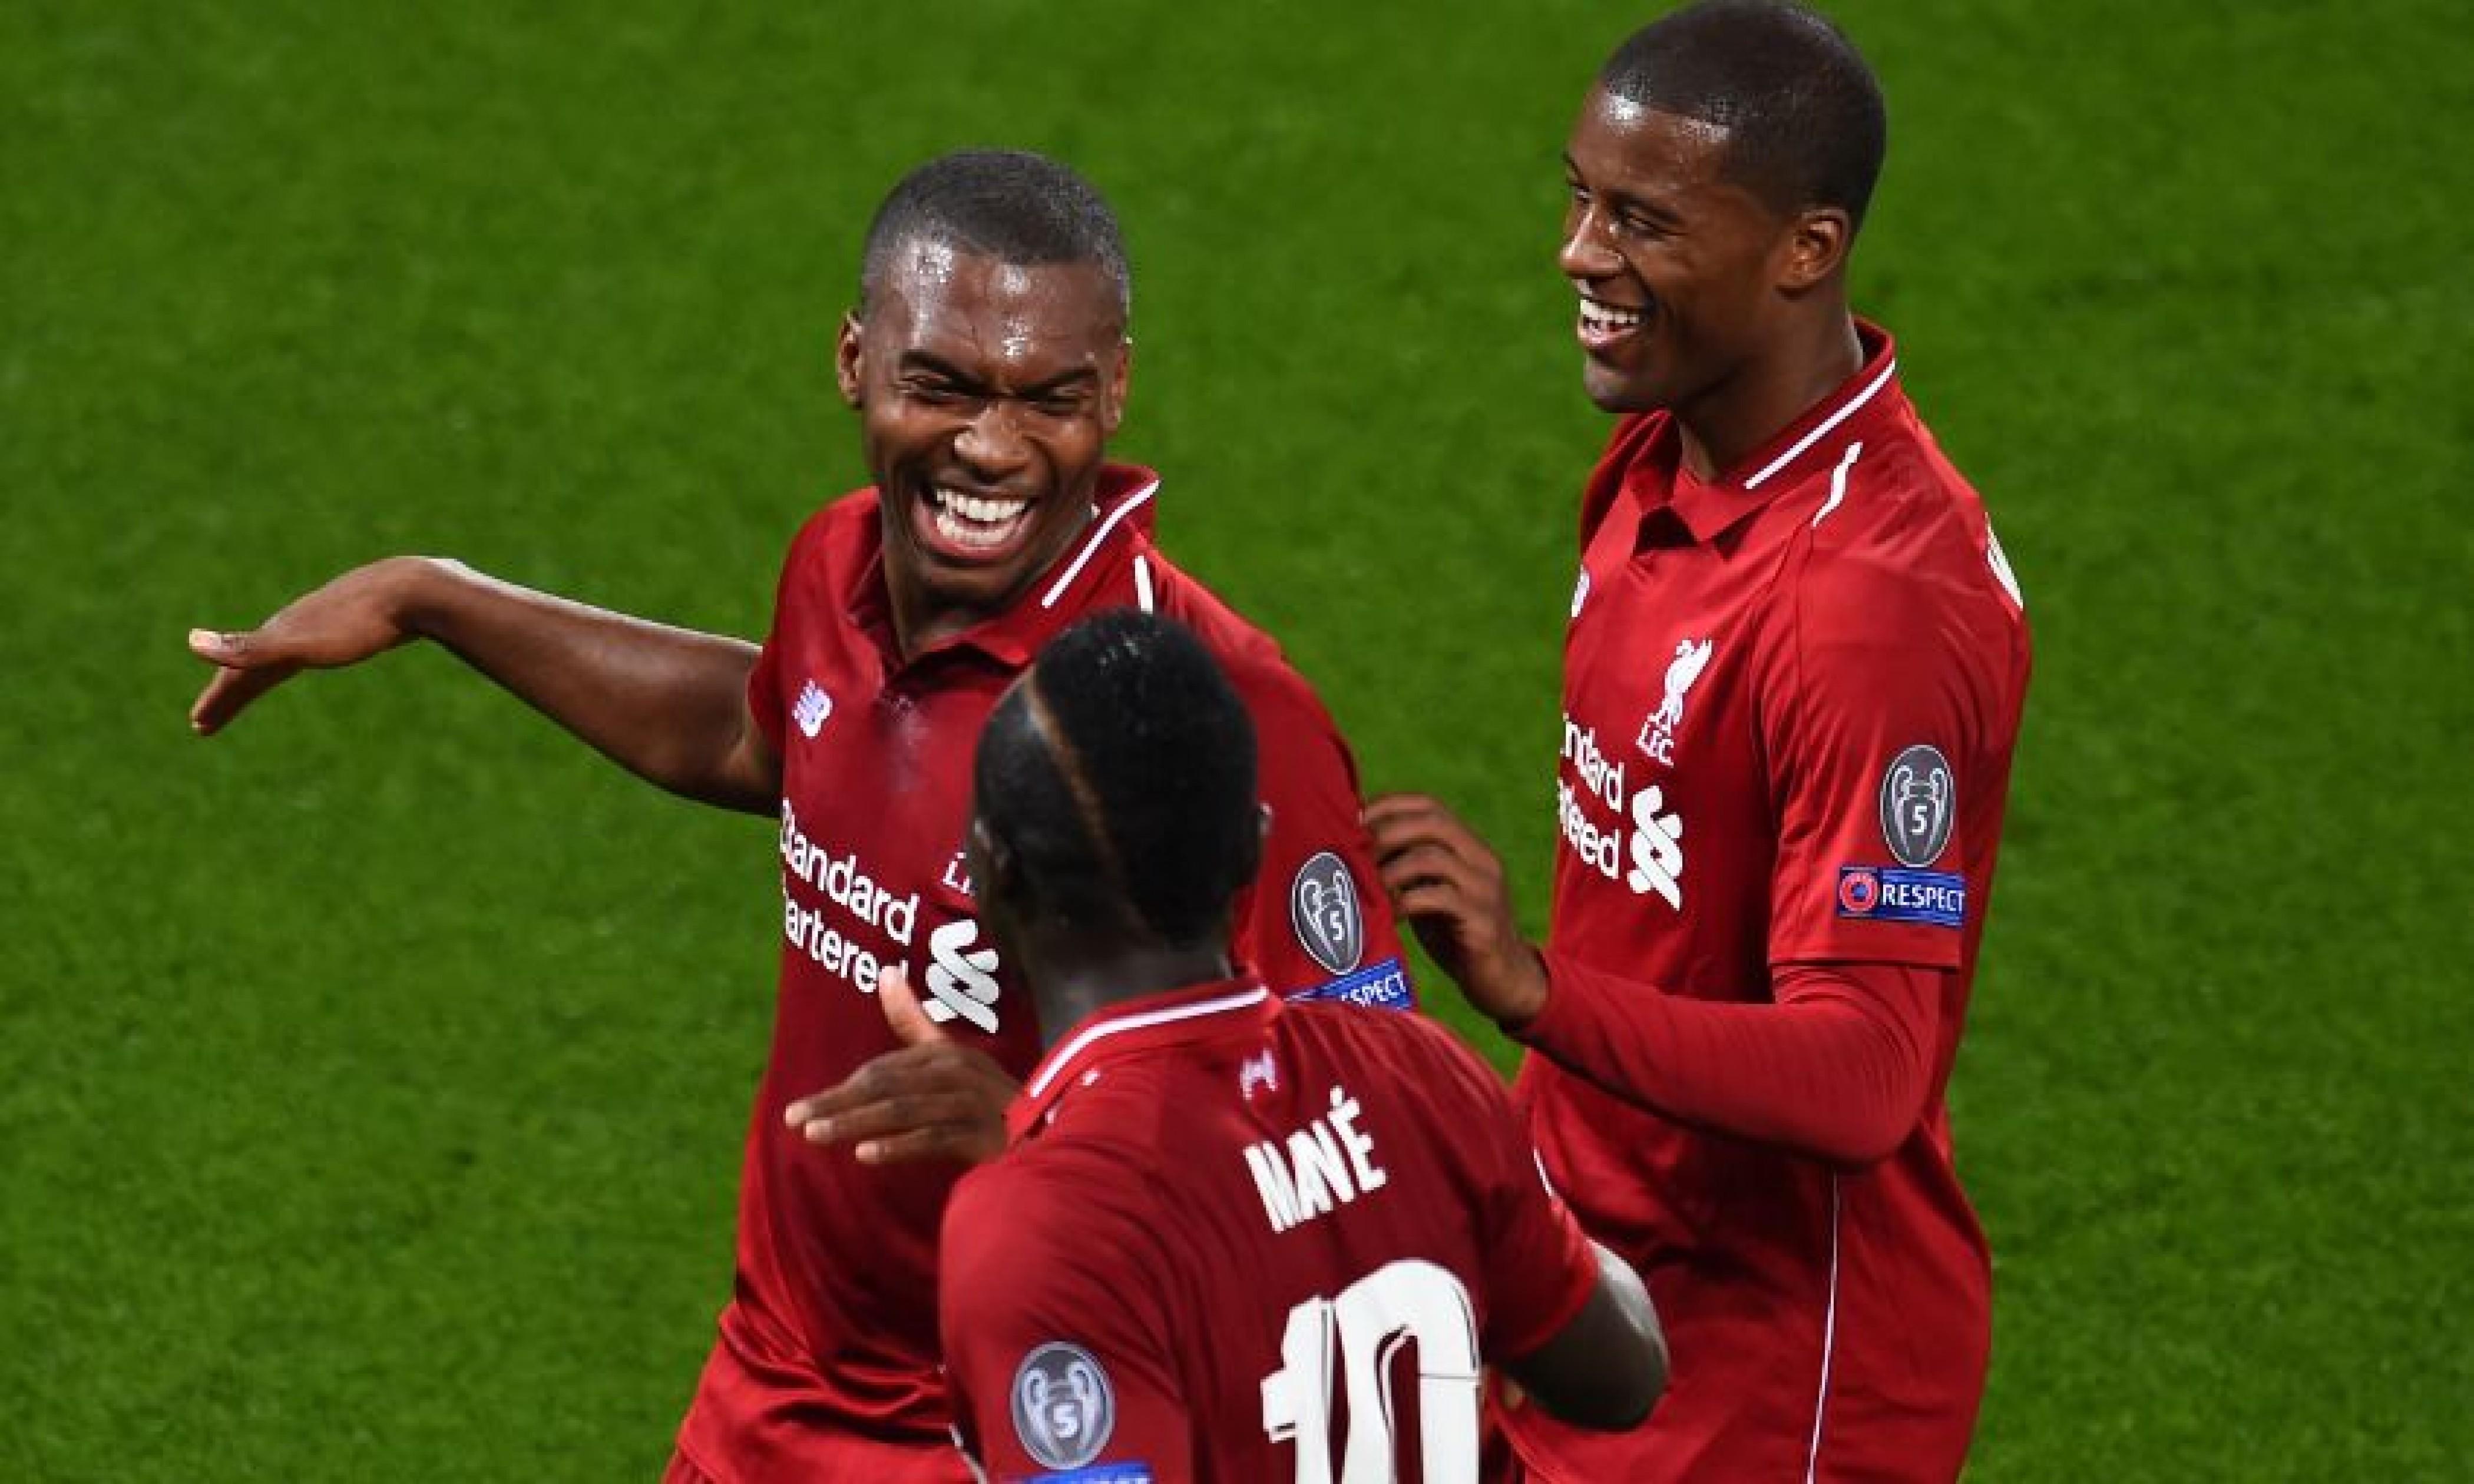 Jurgen Klopp: Liverpool's 'big heart' key to PSG victory